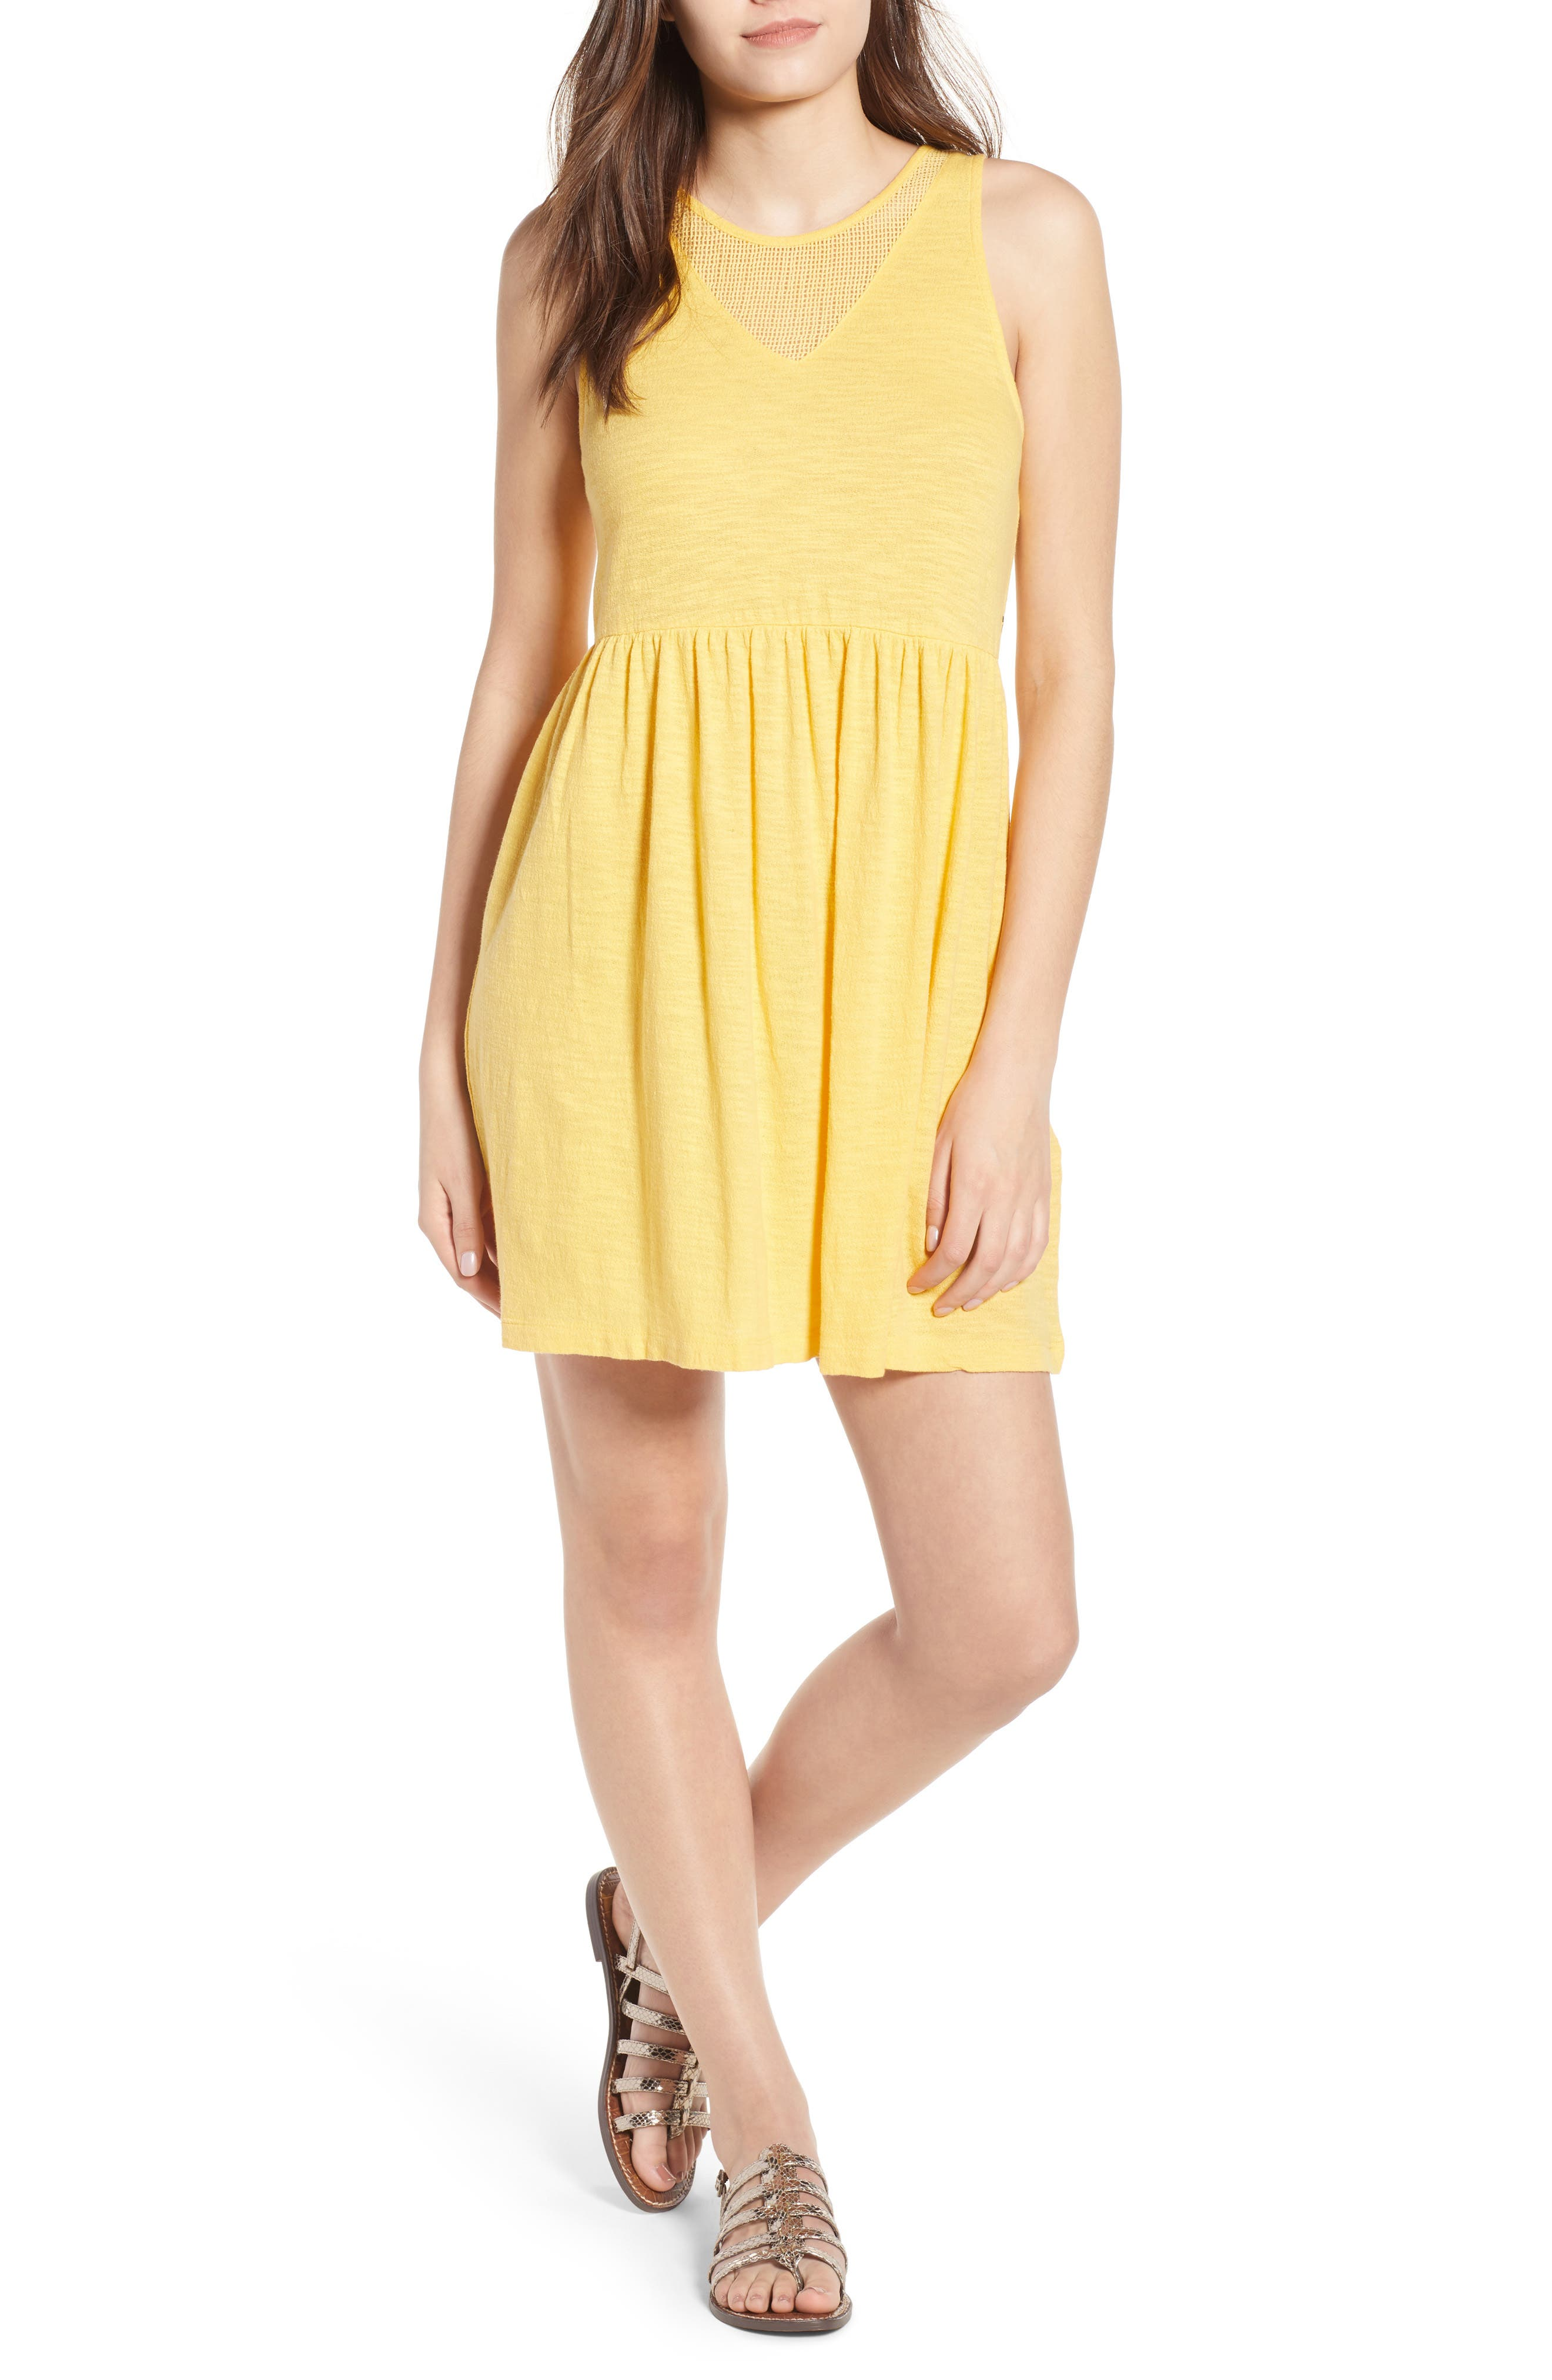 Tucson Cotton Dress,                             Main thumbnail 1, color,                             Buff Yellow